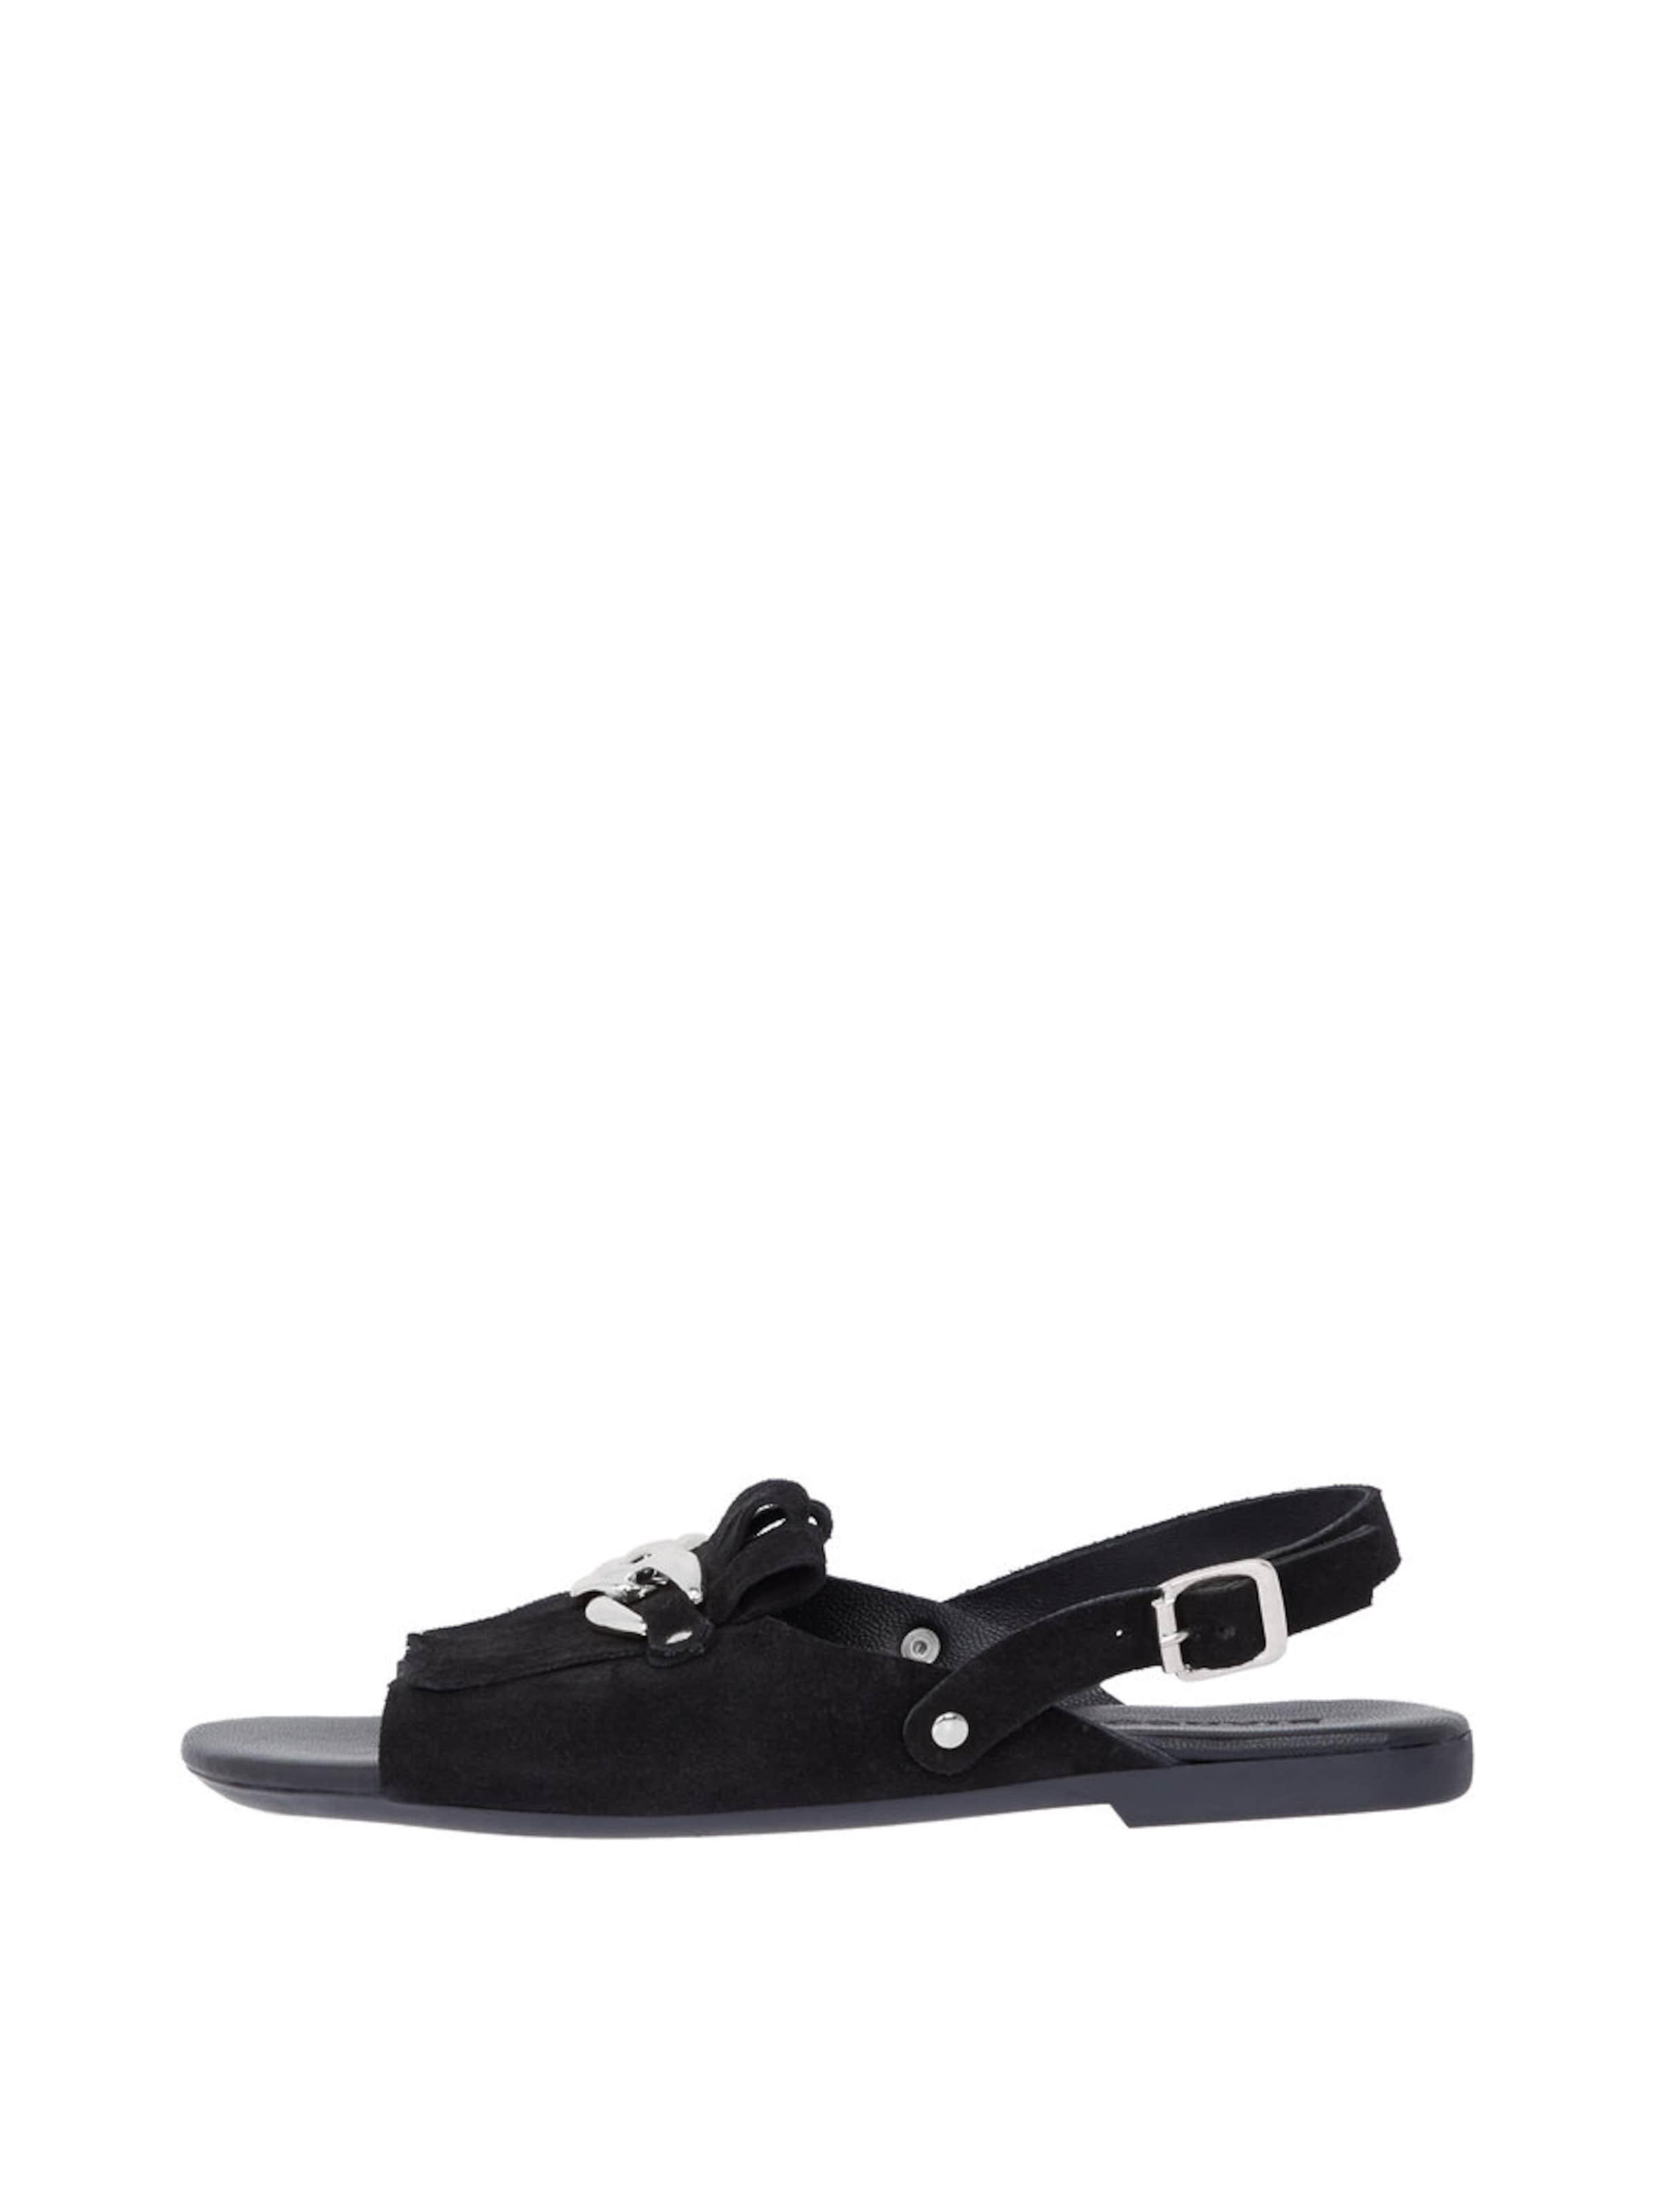 Loriblu Mokassin Damen Schuhe Slipper Mokassins Shop